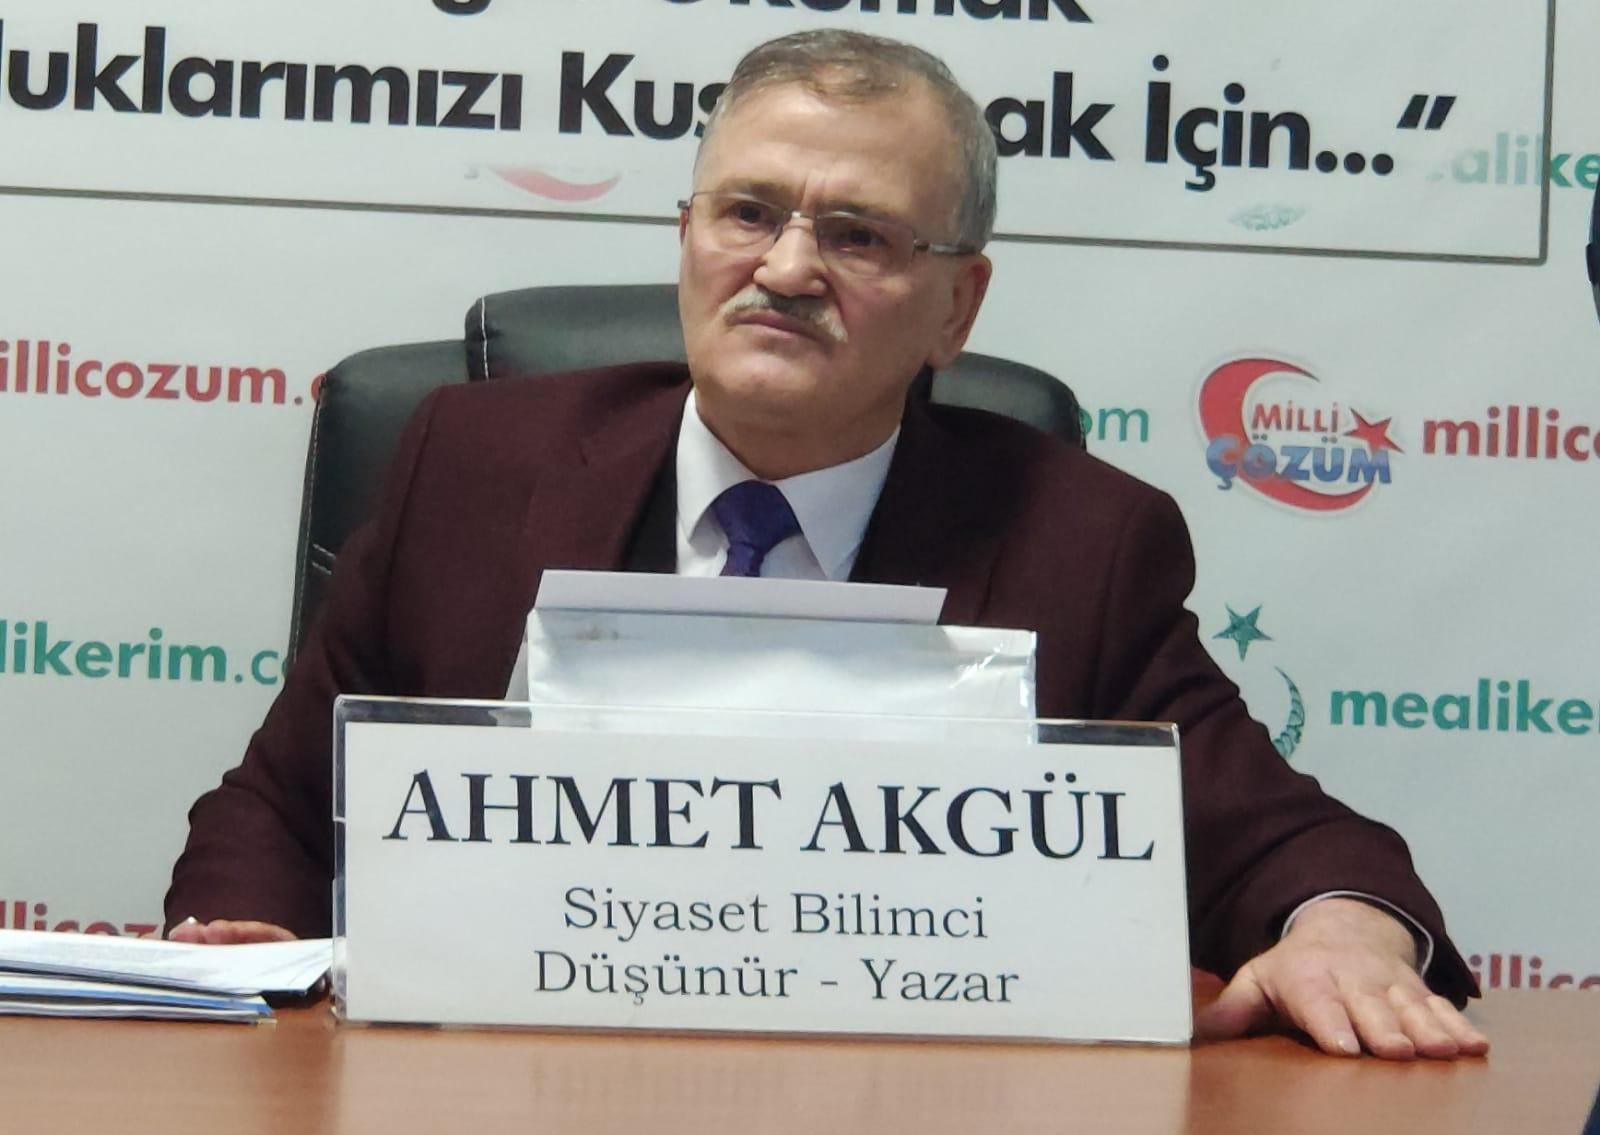 Meal-i Kerim'i Hazırlarken Nelere Dikkat Ettik Siyaset Bilimci-Düşünür Ahmet Akgül